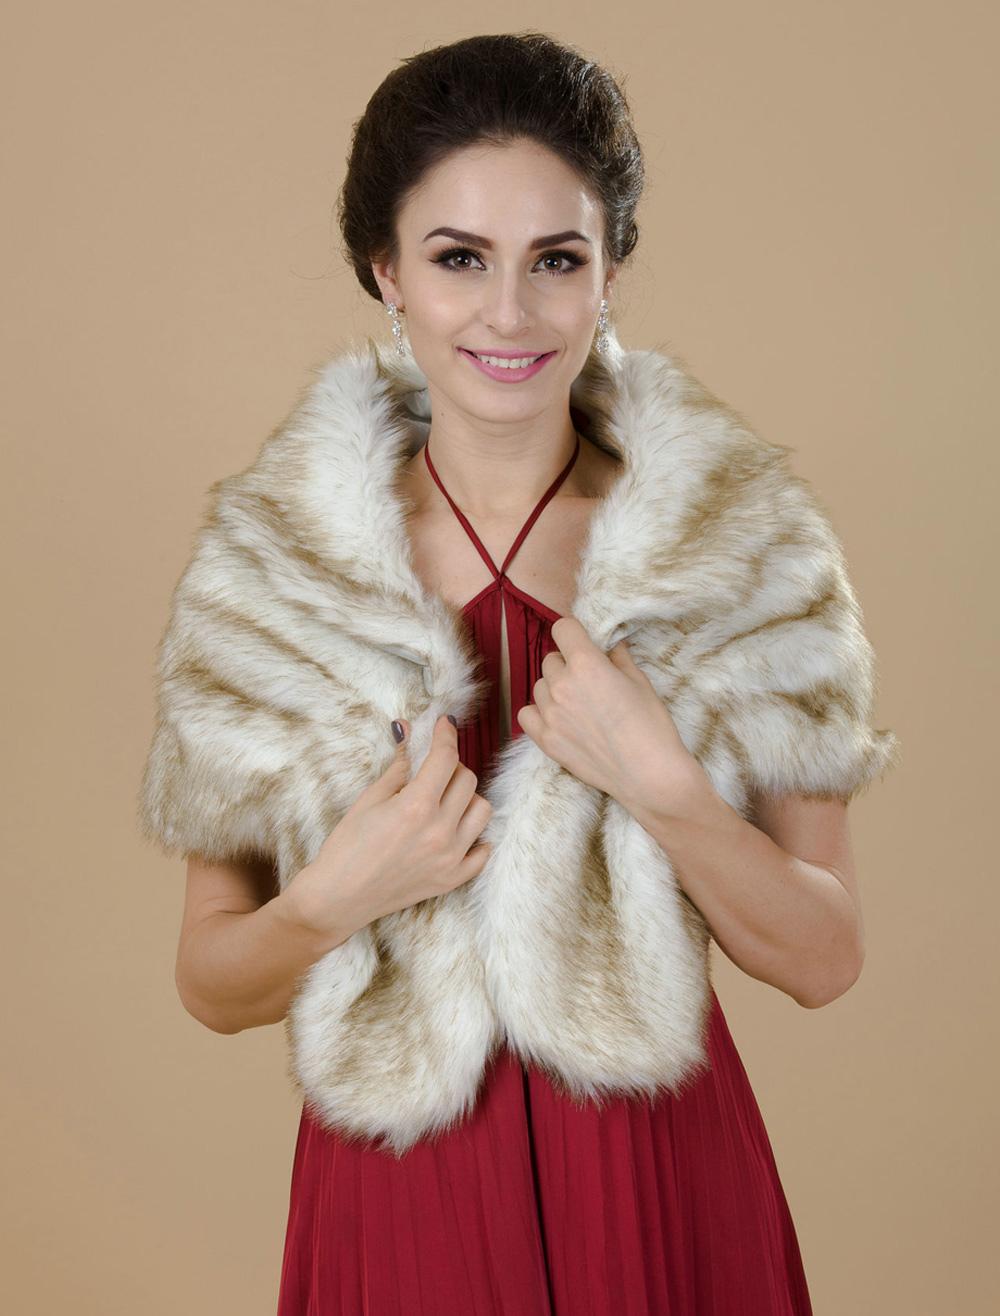 Champagne Faux Fur Wedding Shawl For Bride $24.99 AT vintagedancer.com